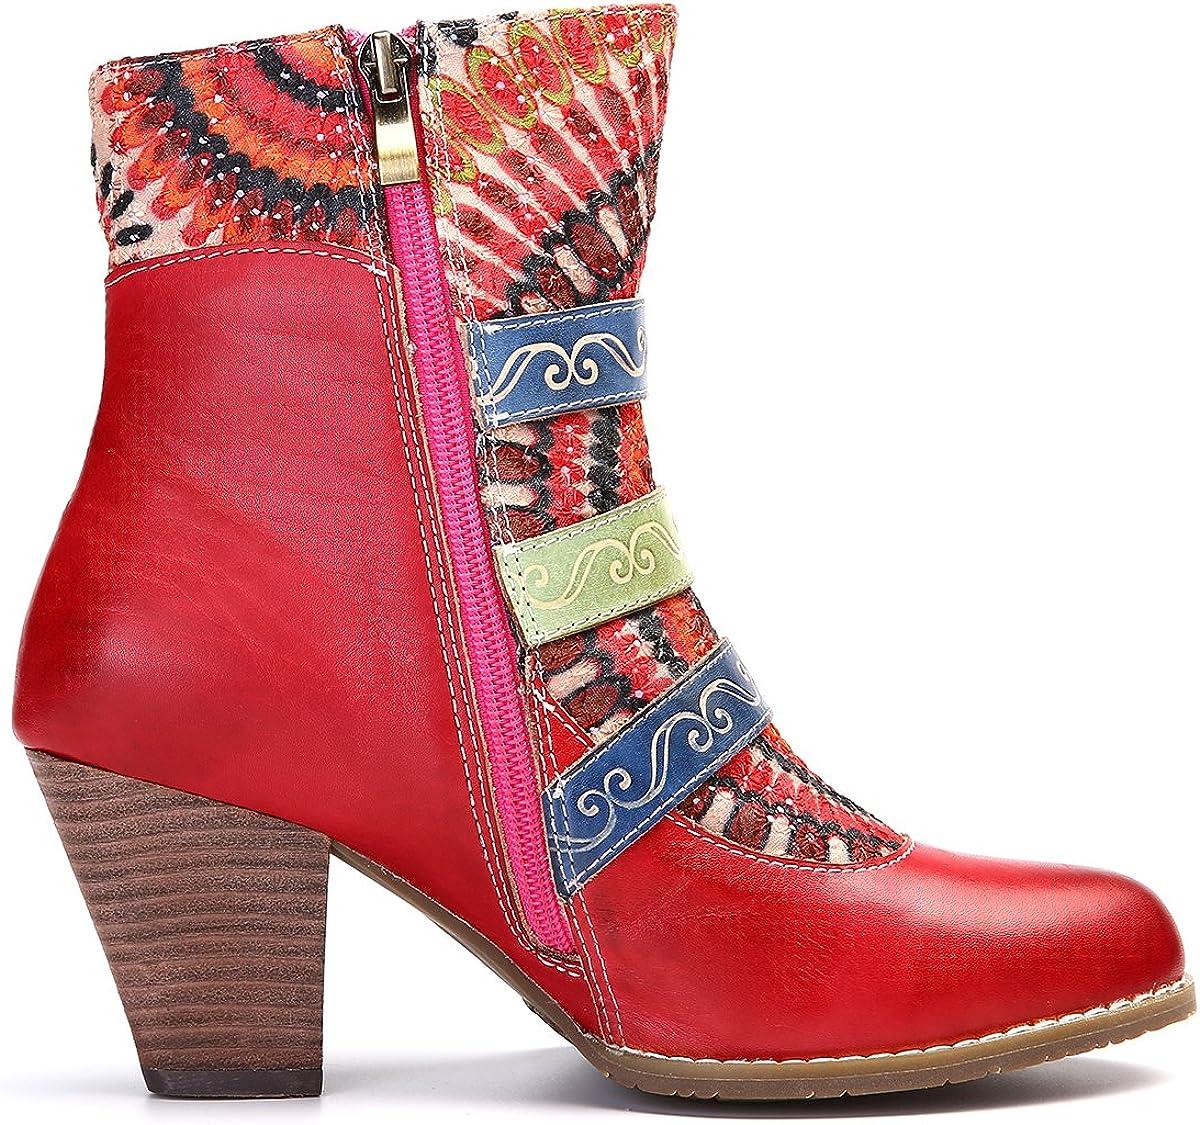 Leather Boots High Block Heel Bohemian Splicing Pattern Side Zipper Toe Bootie gracosy Ankle Booties for Women